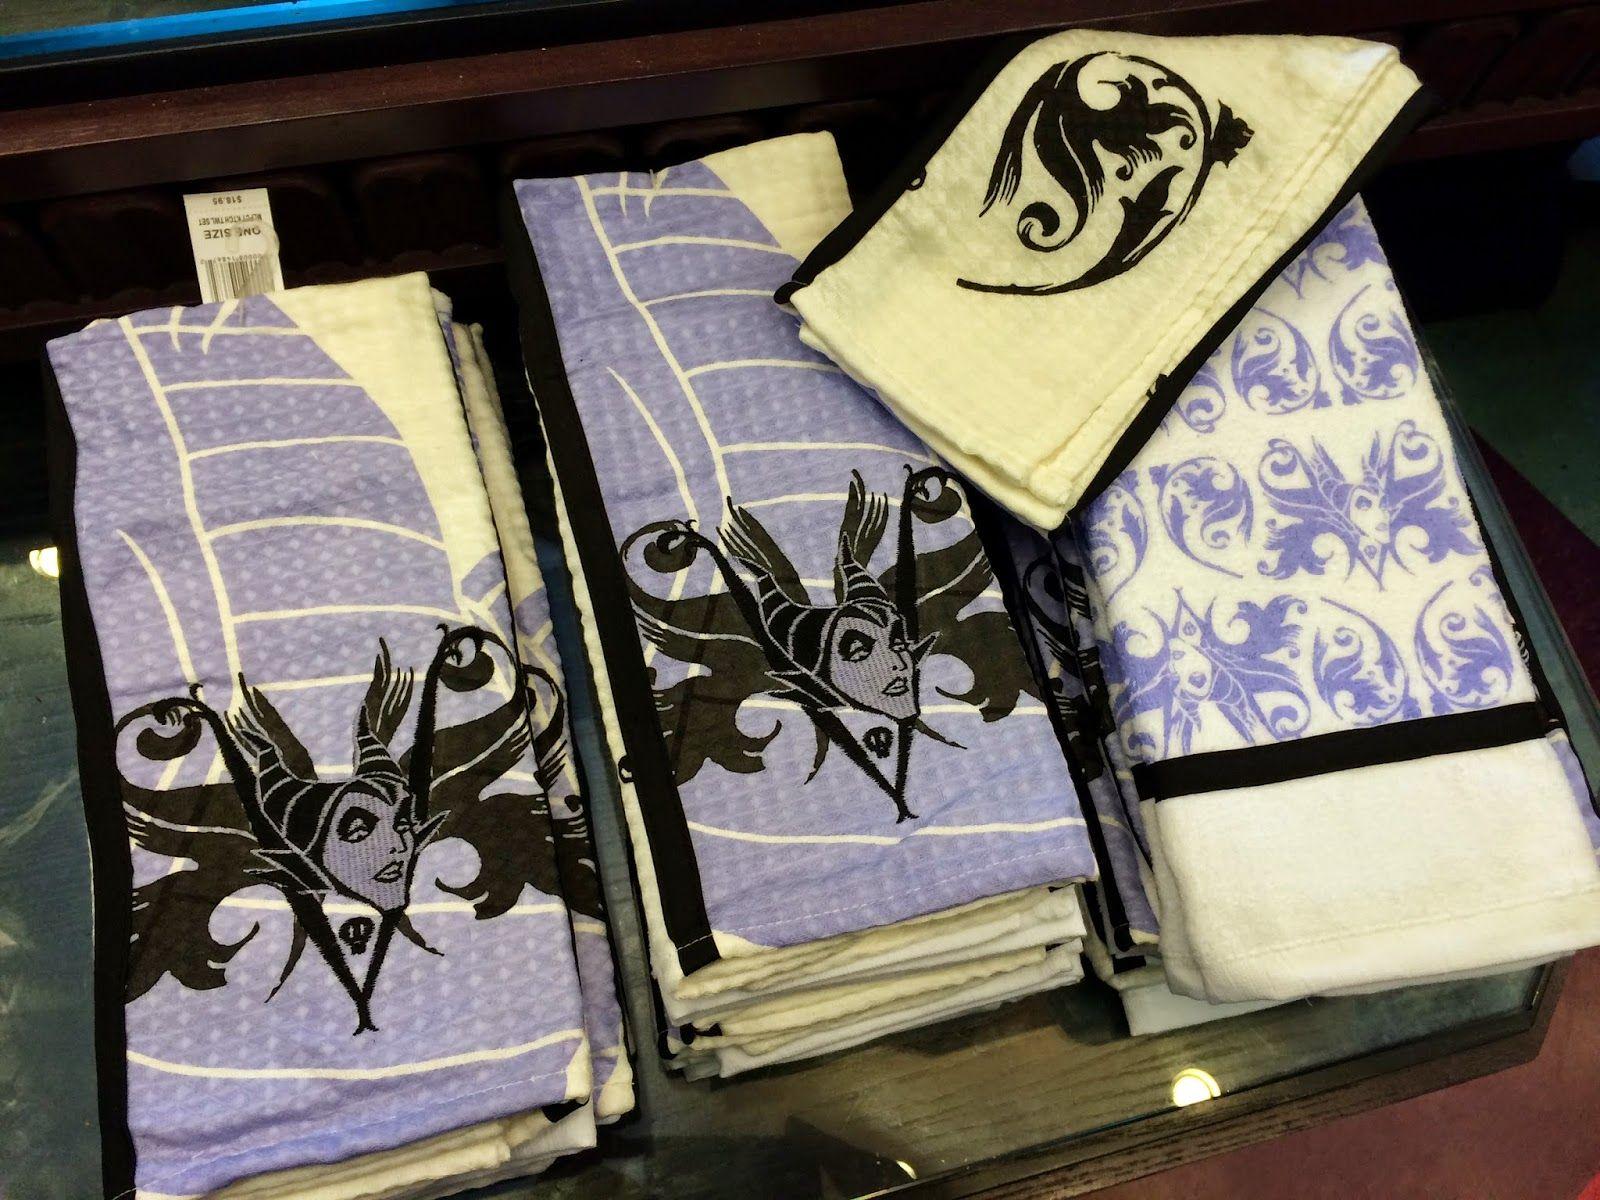 maleficent disney villain kitchen towel set how perfect would